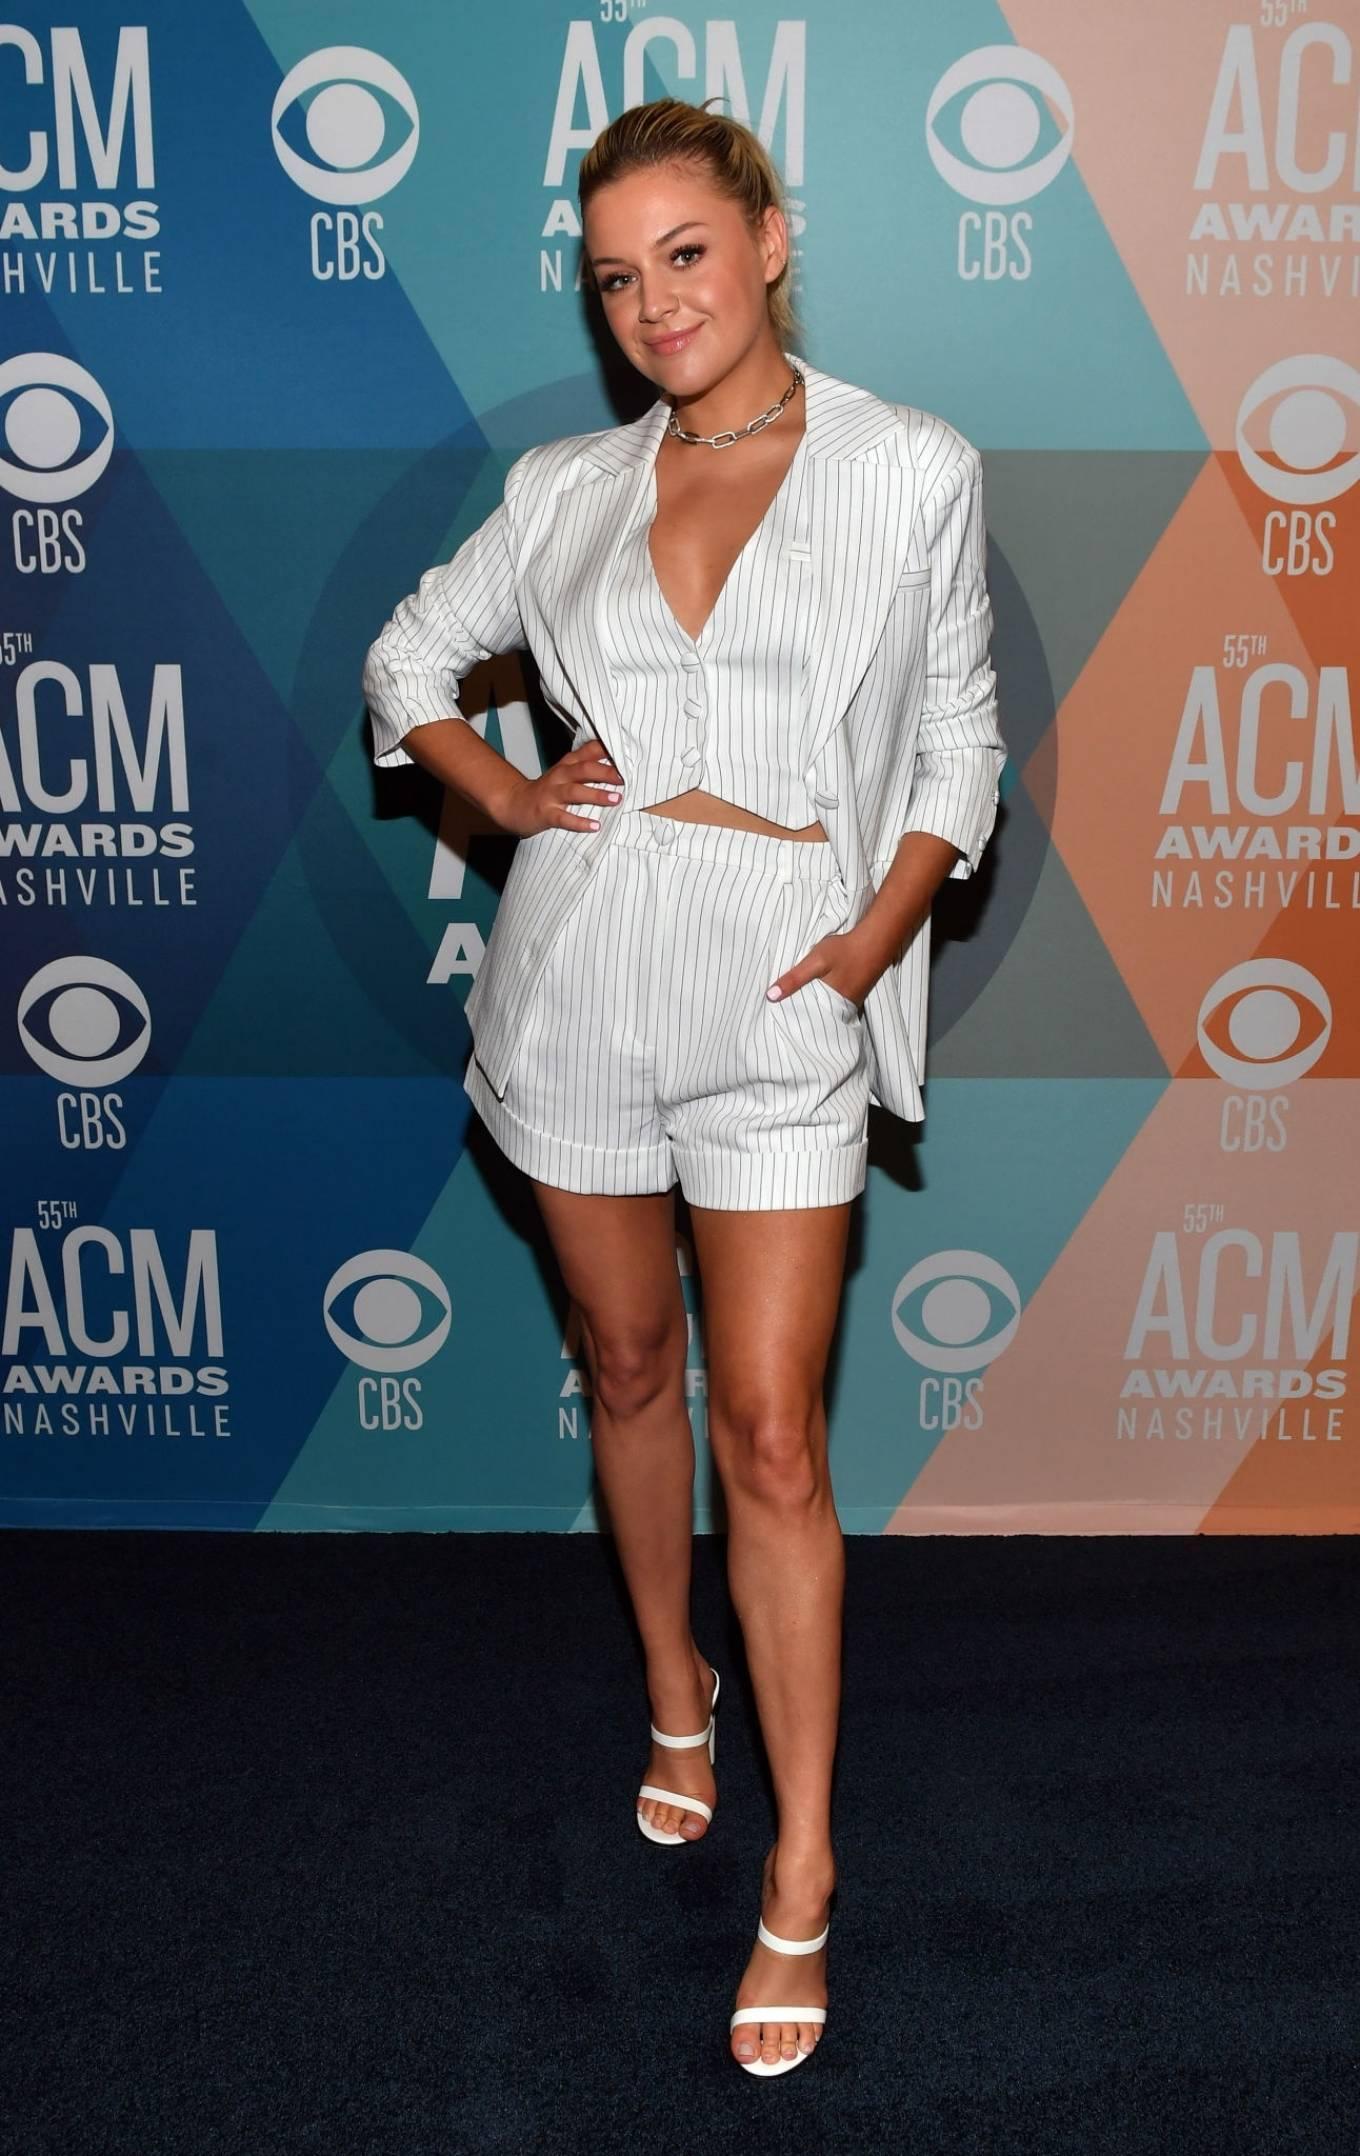 Kelsea Ballerini 2020 : Kelsea Ballerini – 2020 Academy Of Country Music Awards Virtual Radio Row in Nashville-08